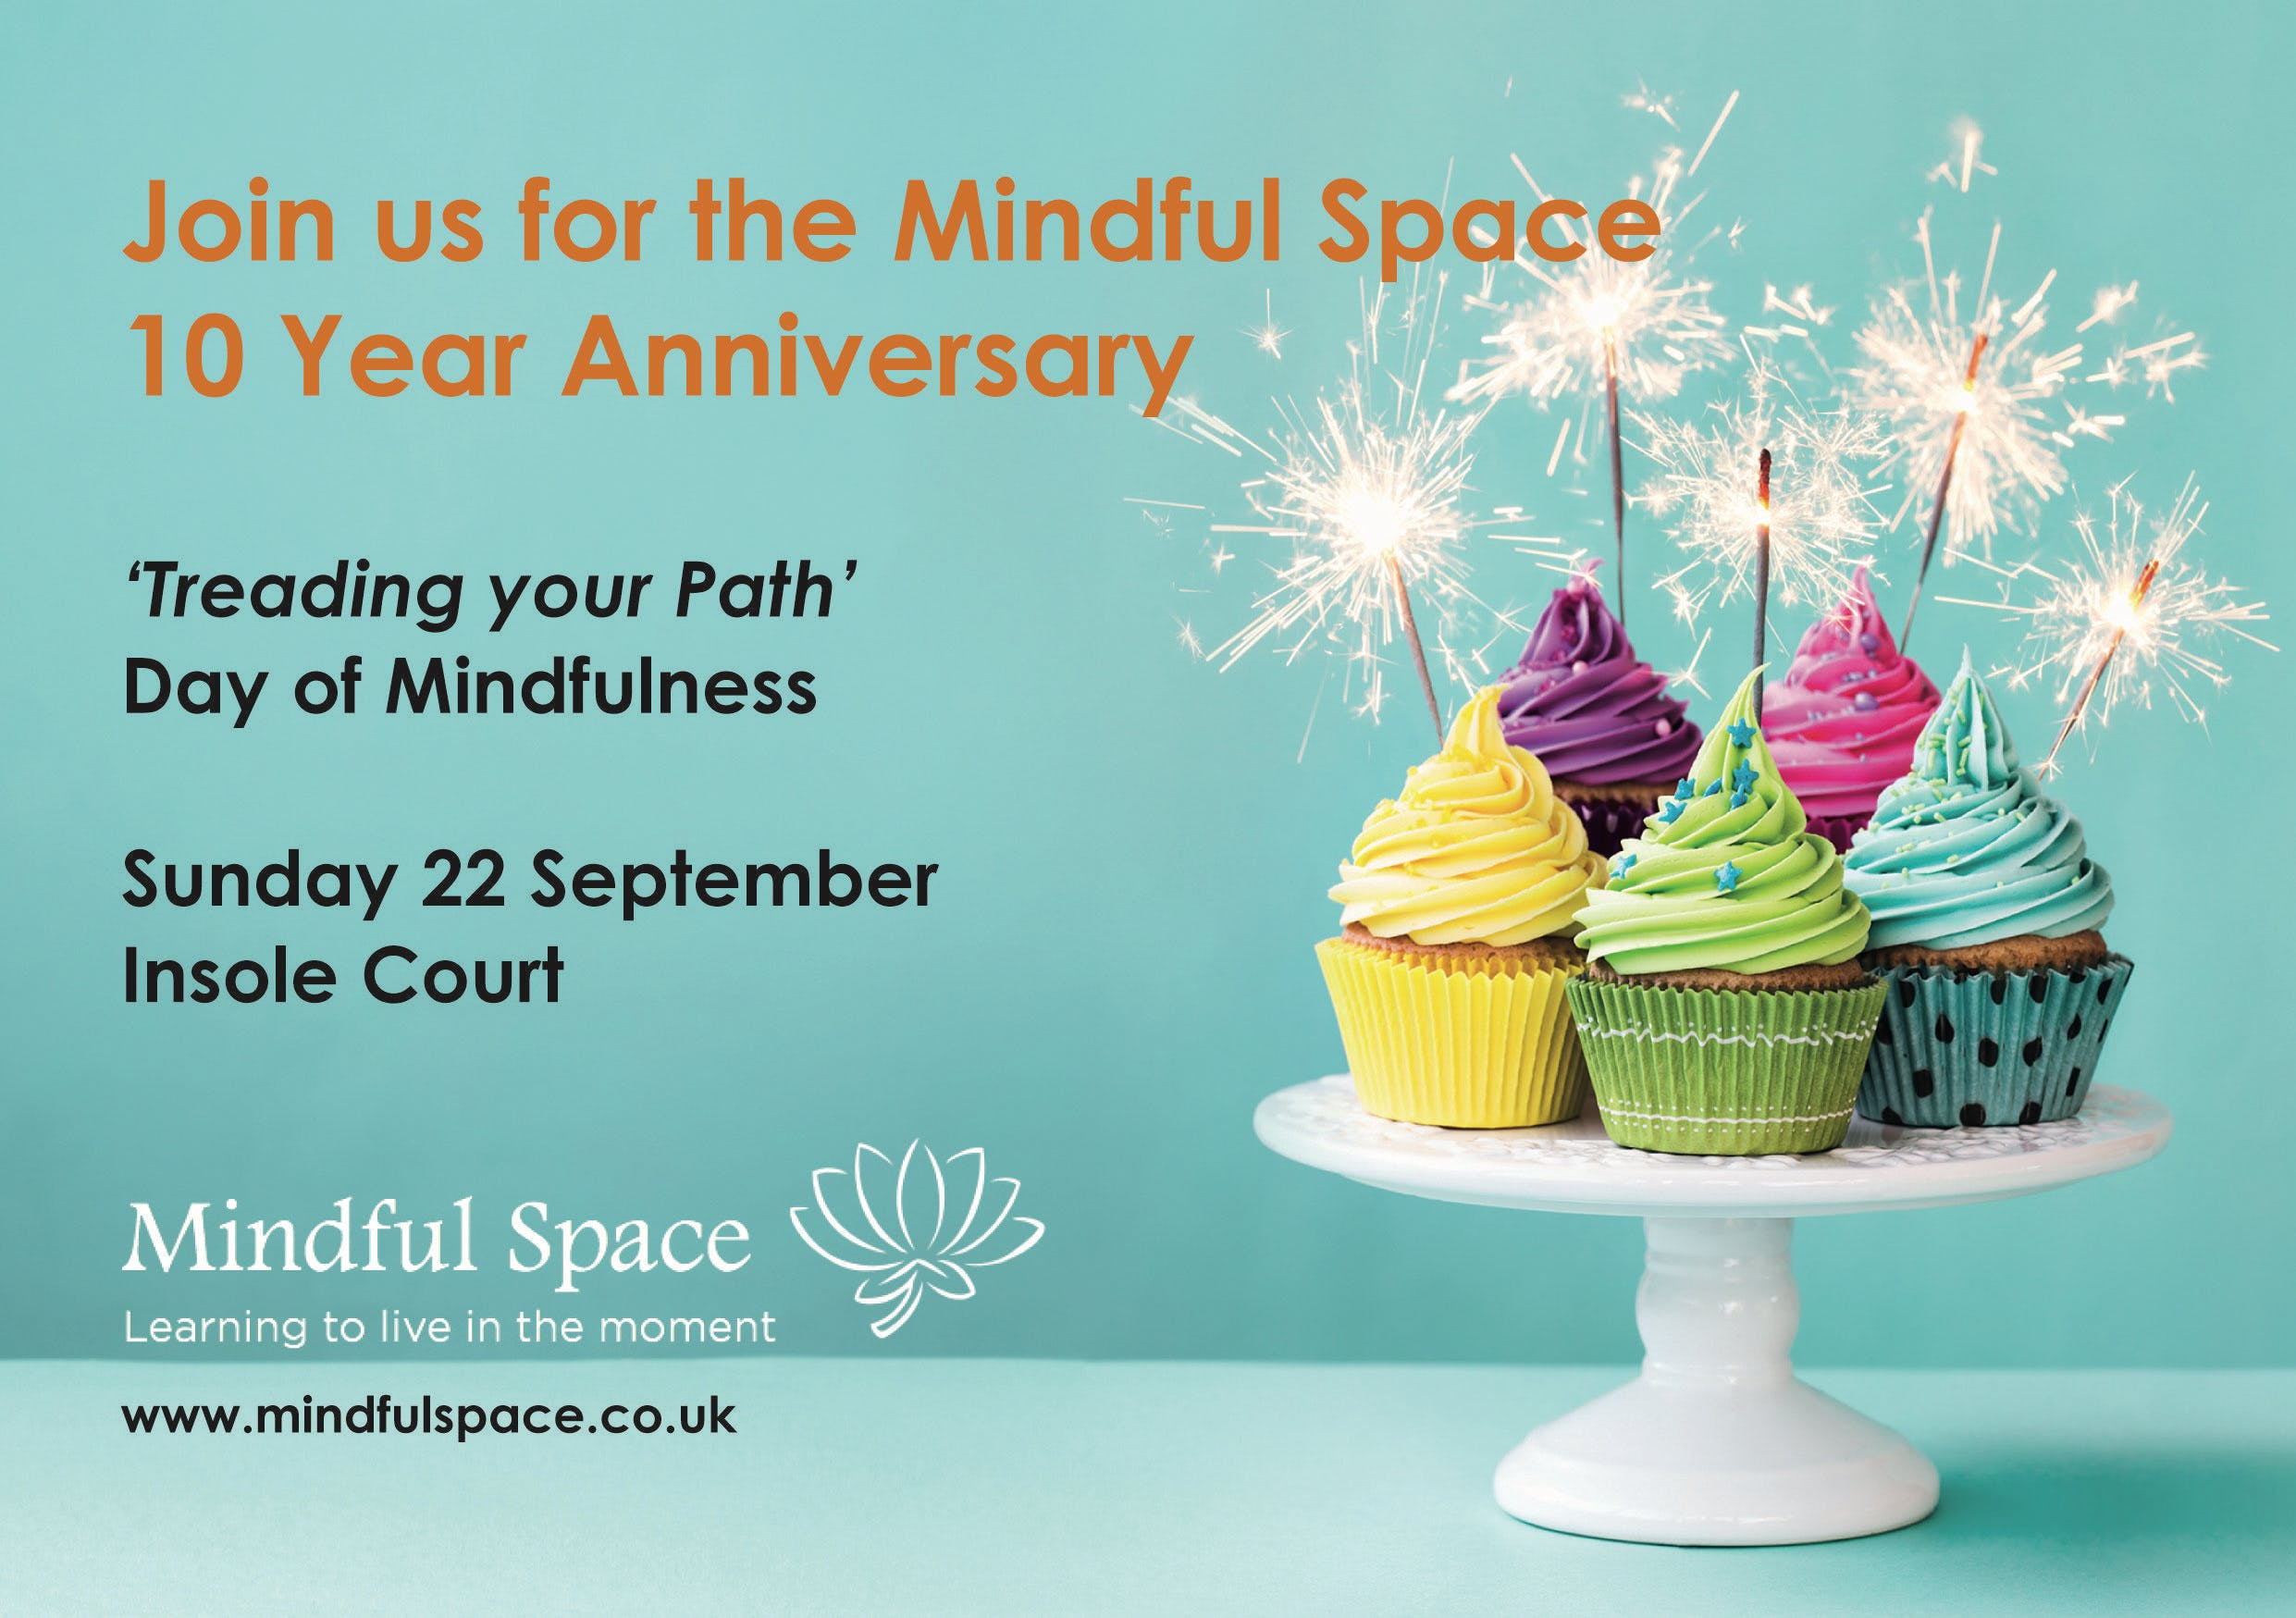 'Treading your path', Day of Mindfulness, Sunday 22 September, Cardiff